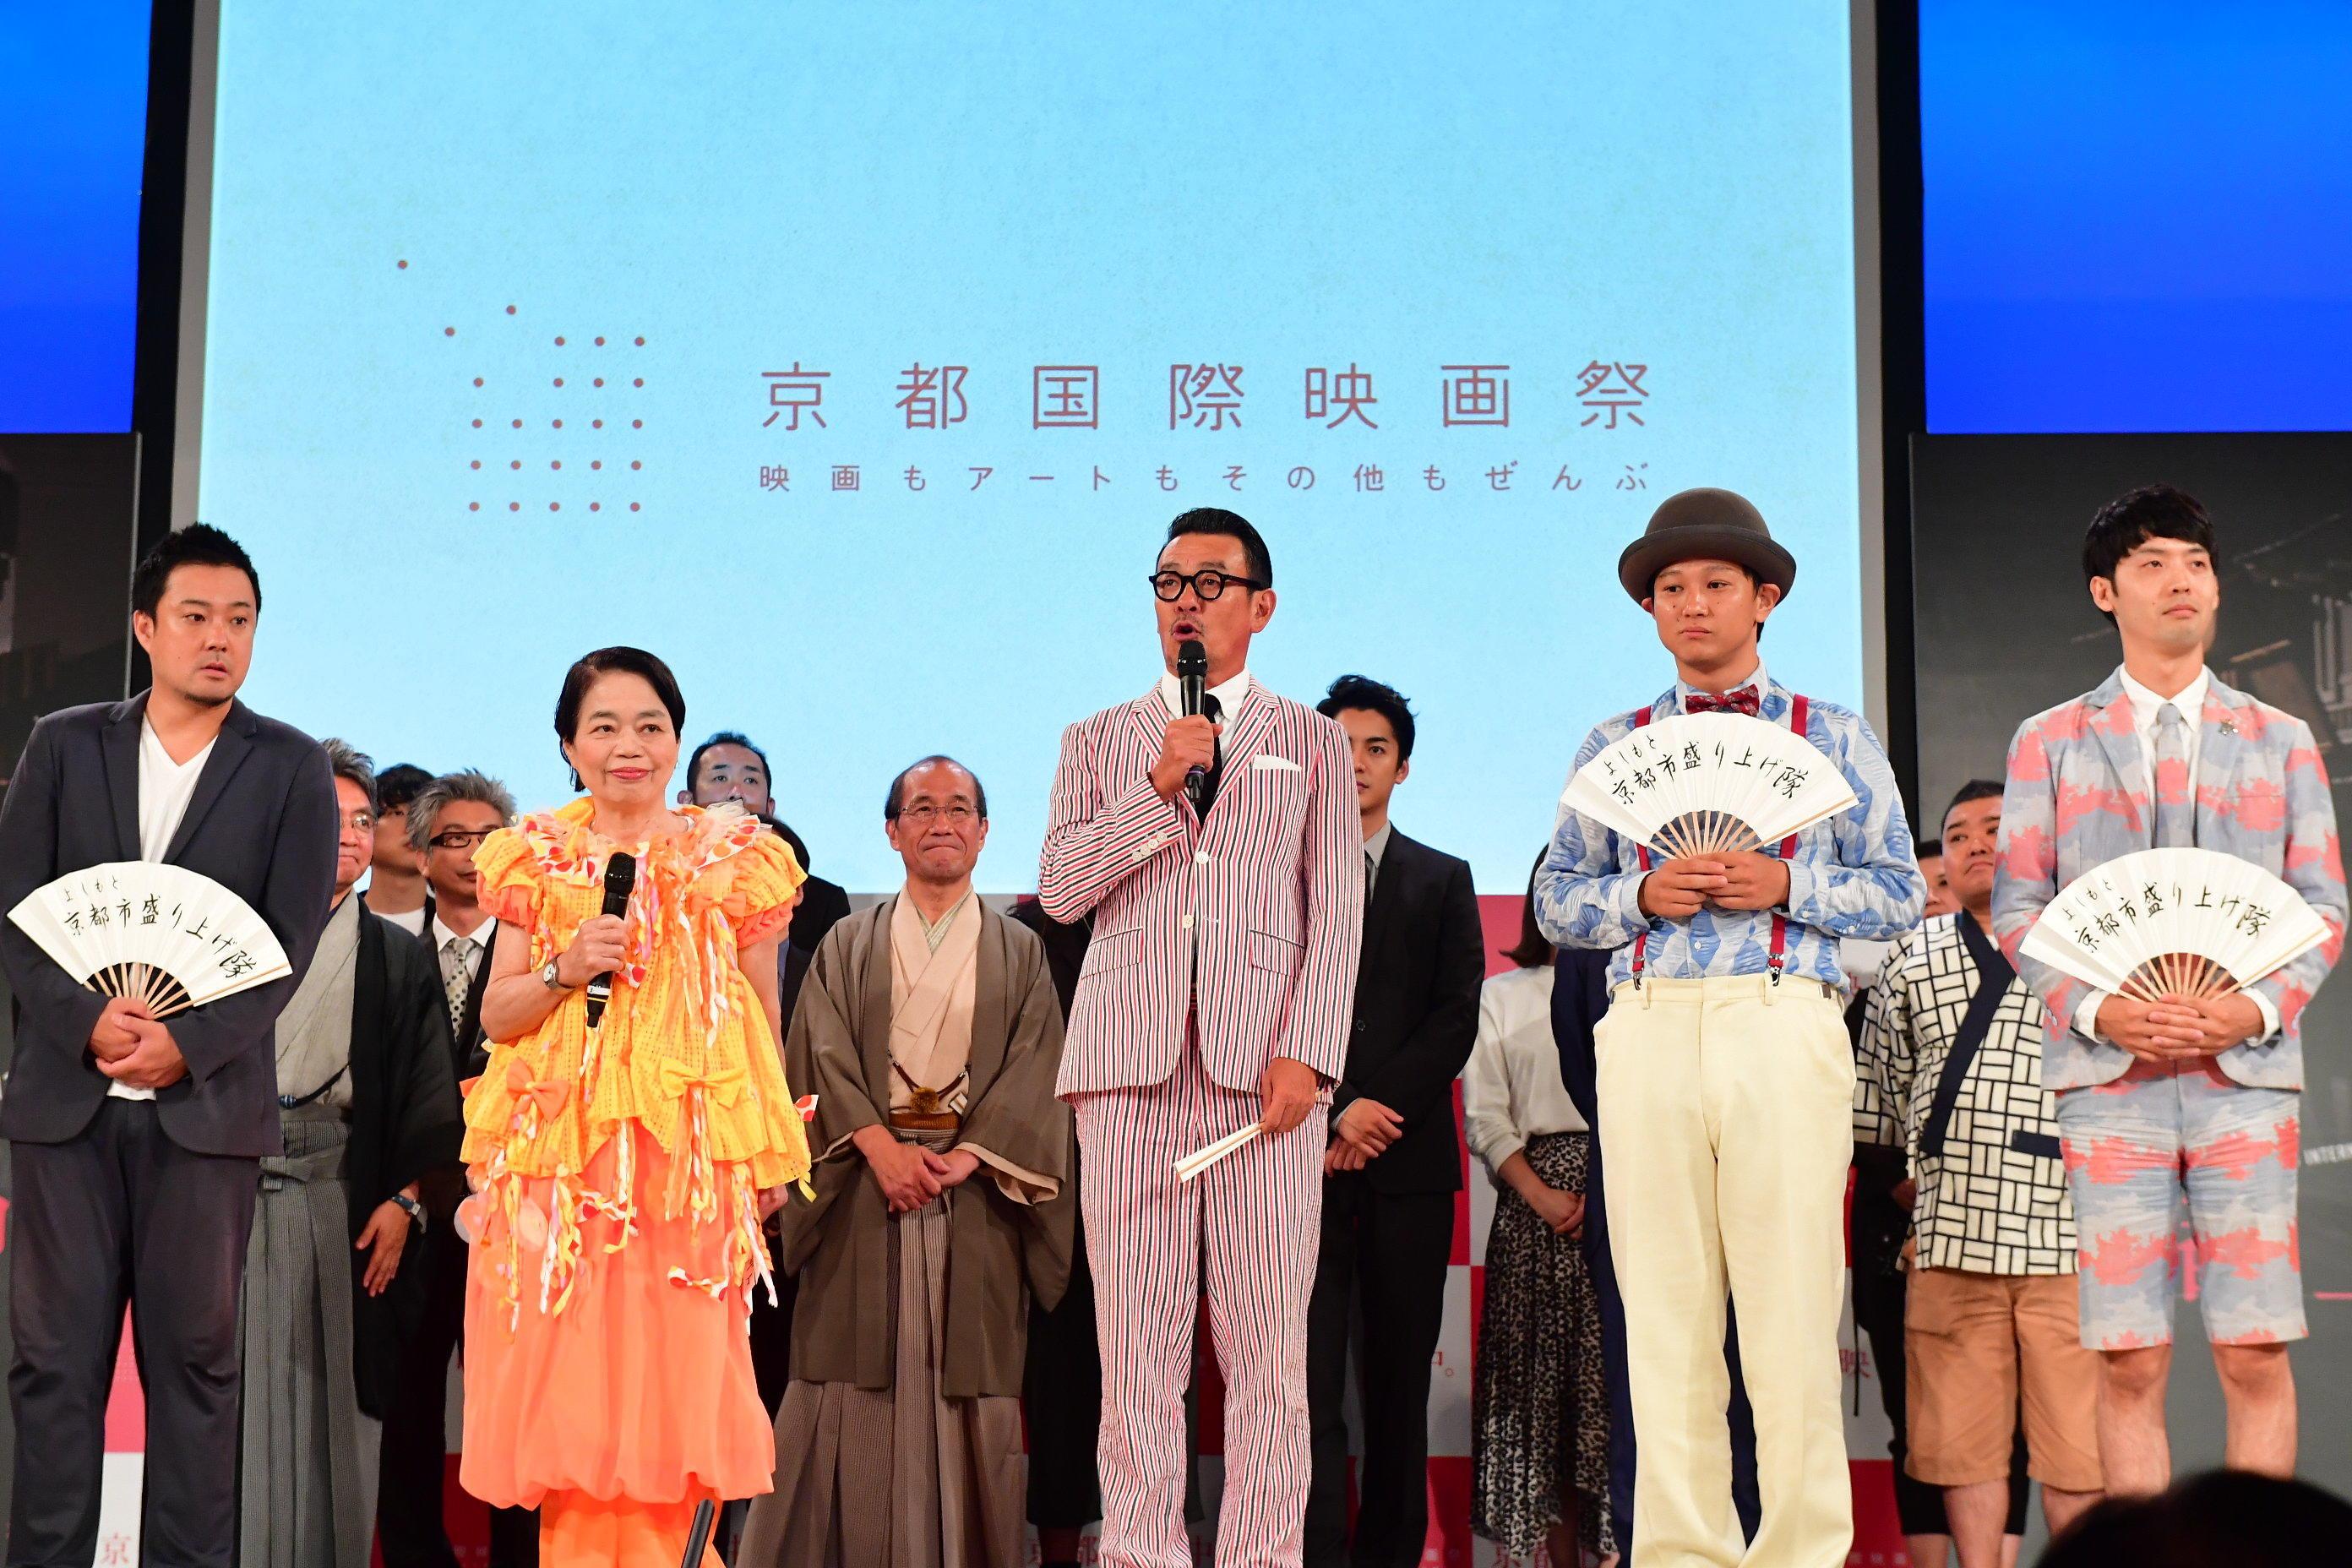 http://news.yoshimoto.co.jp/20180903234250-5d7e4a2bfe7c6a7193210ad8ebfd4687748fa98e.jpg